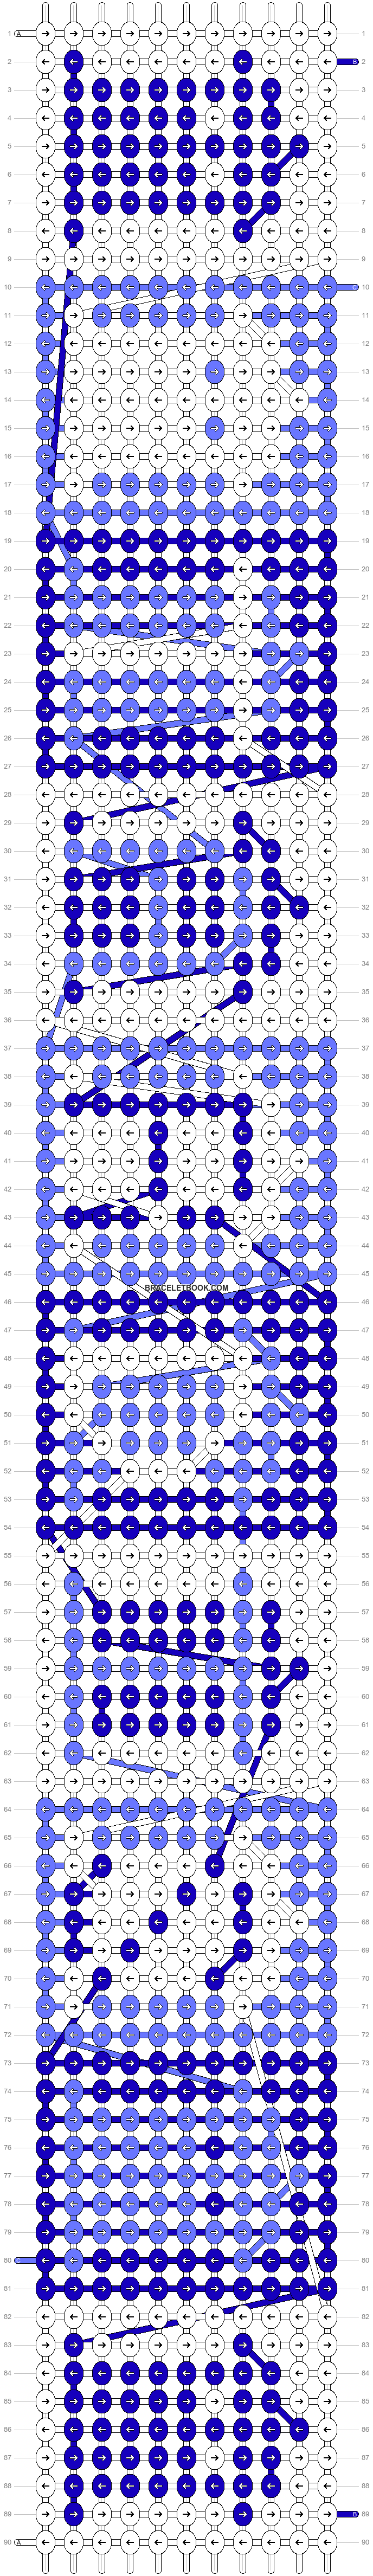 Alpha pattern #10979 pattern